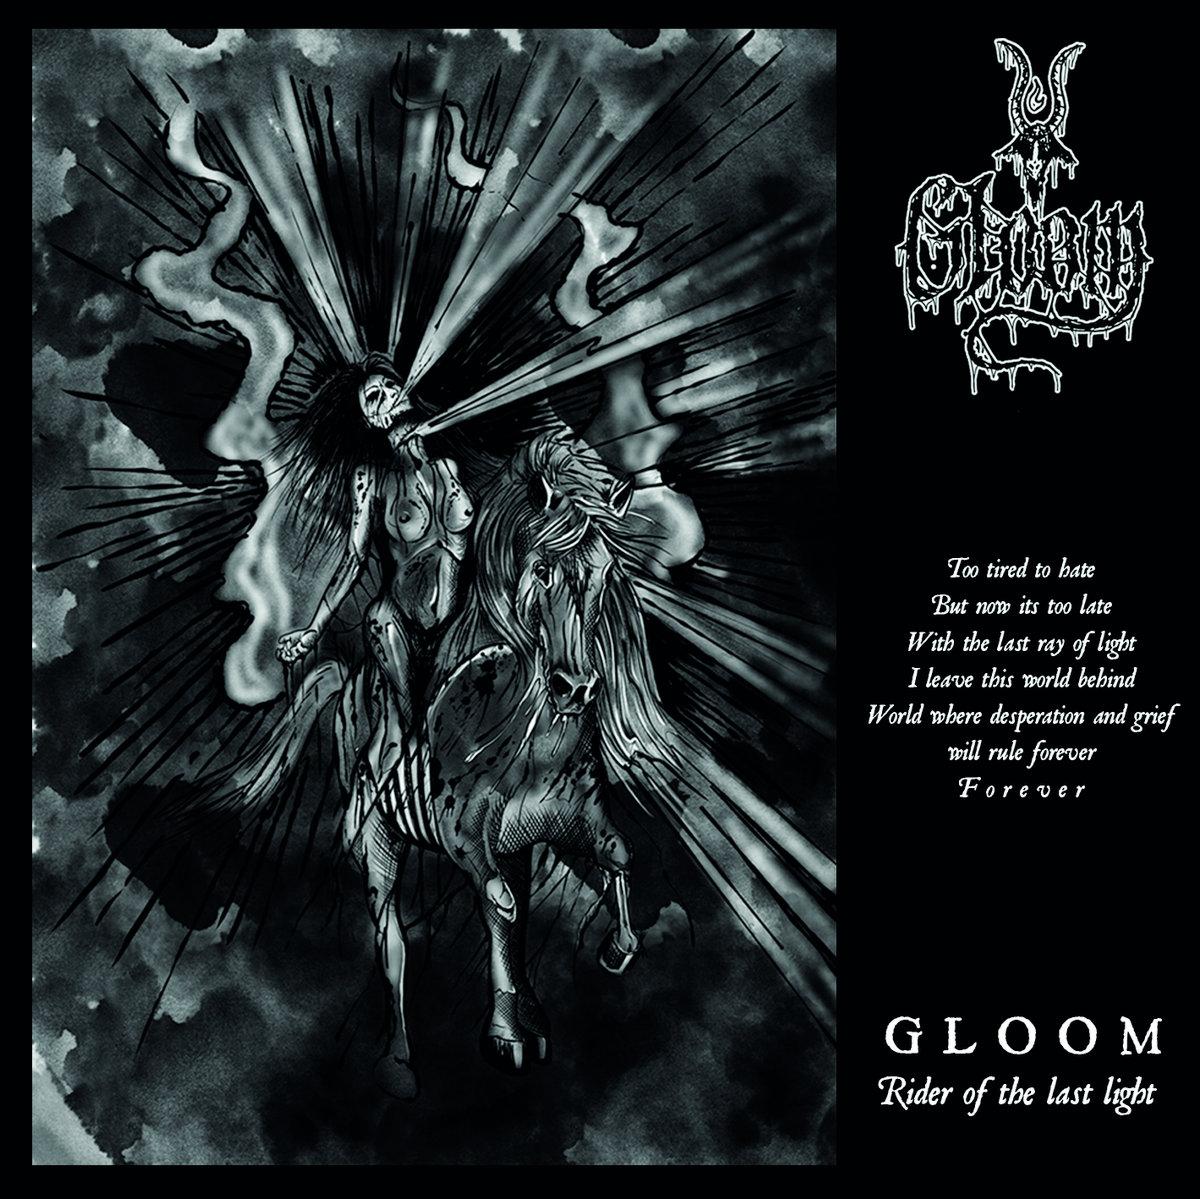 gloom – rider of the last light